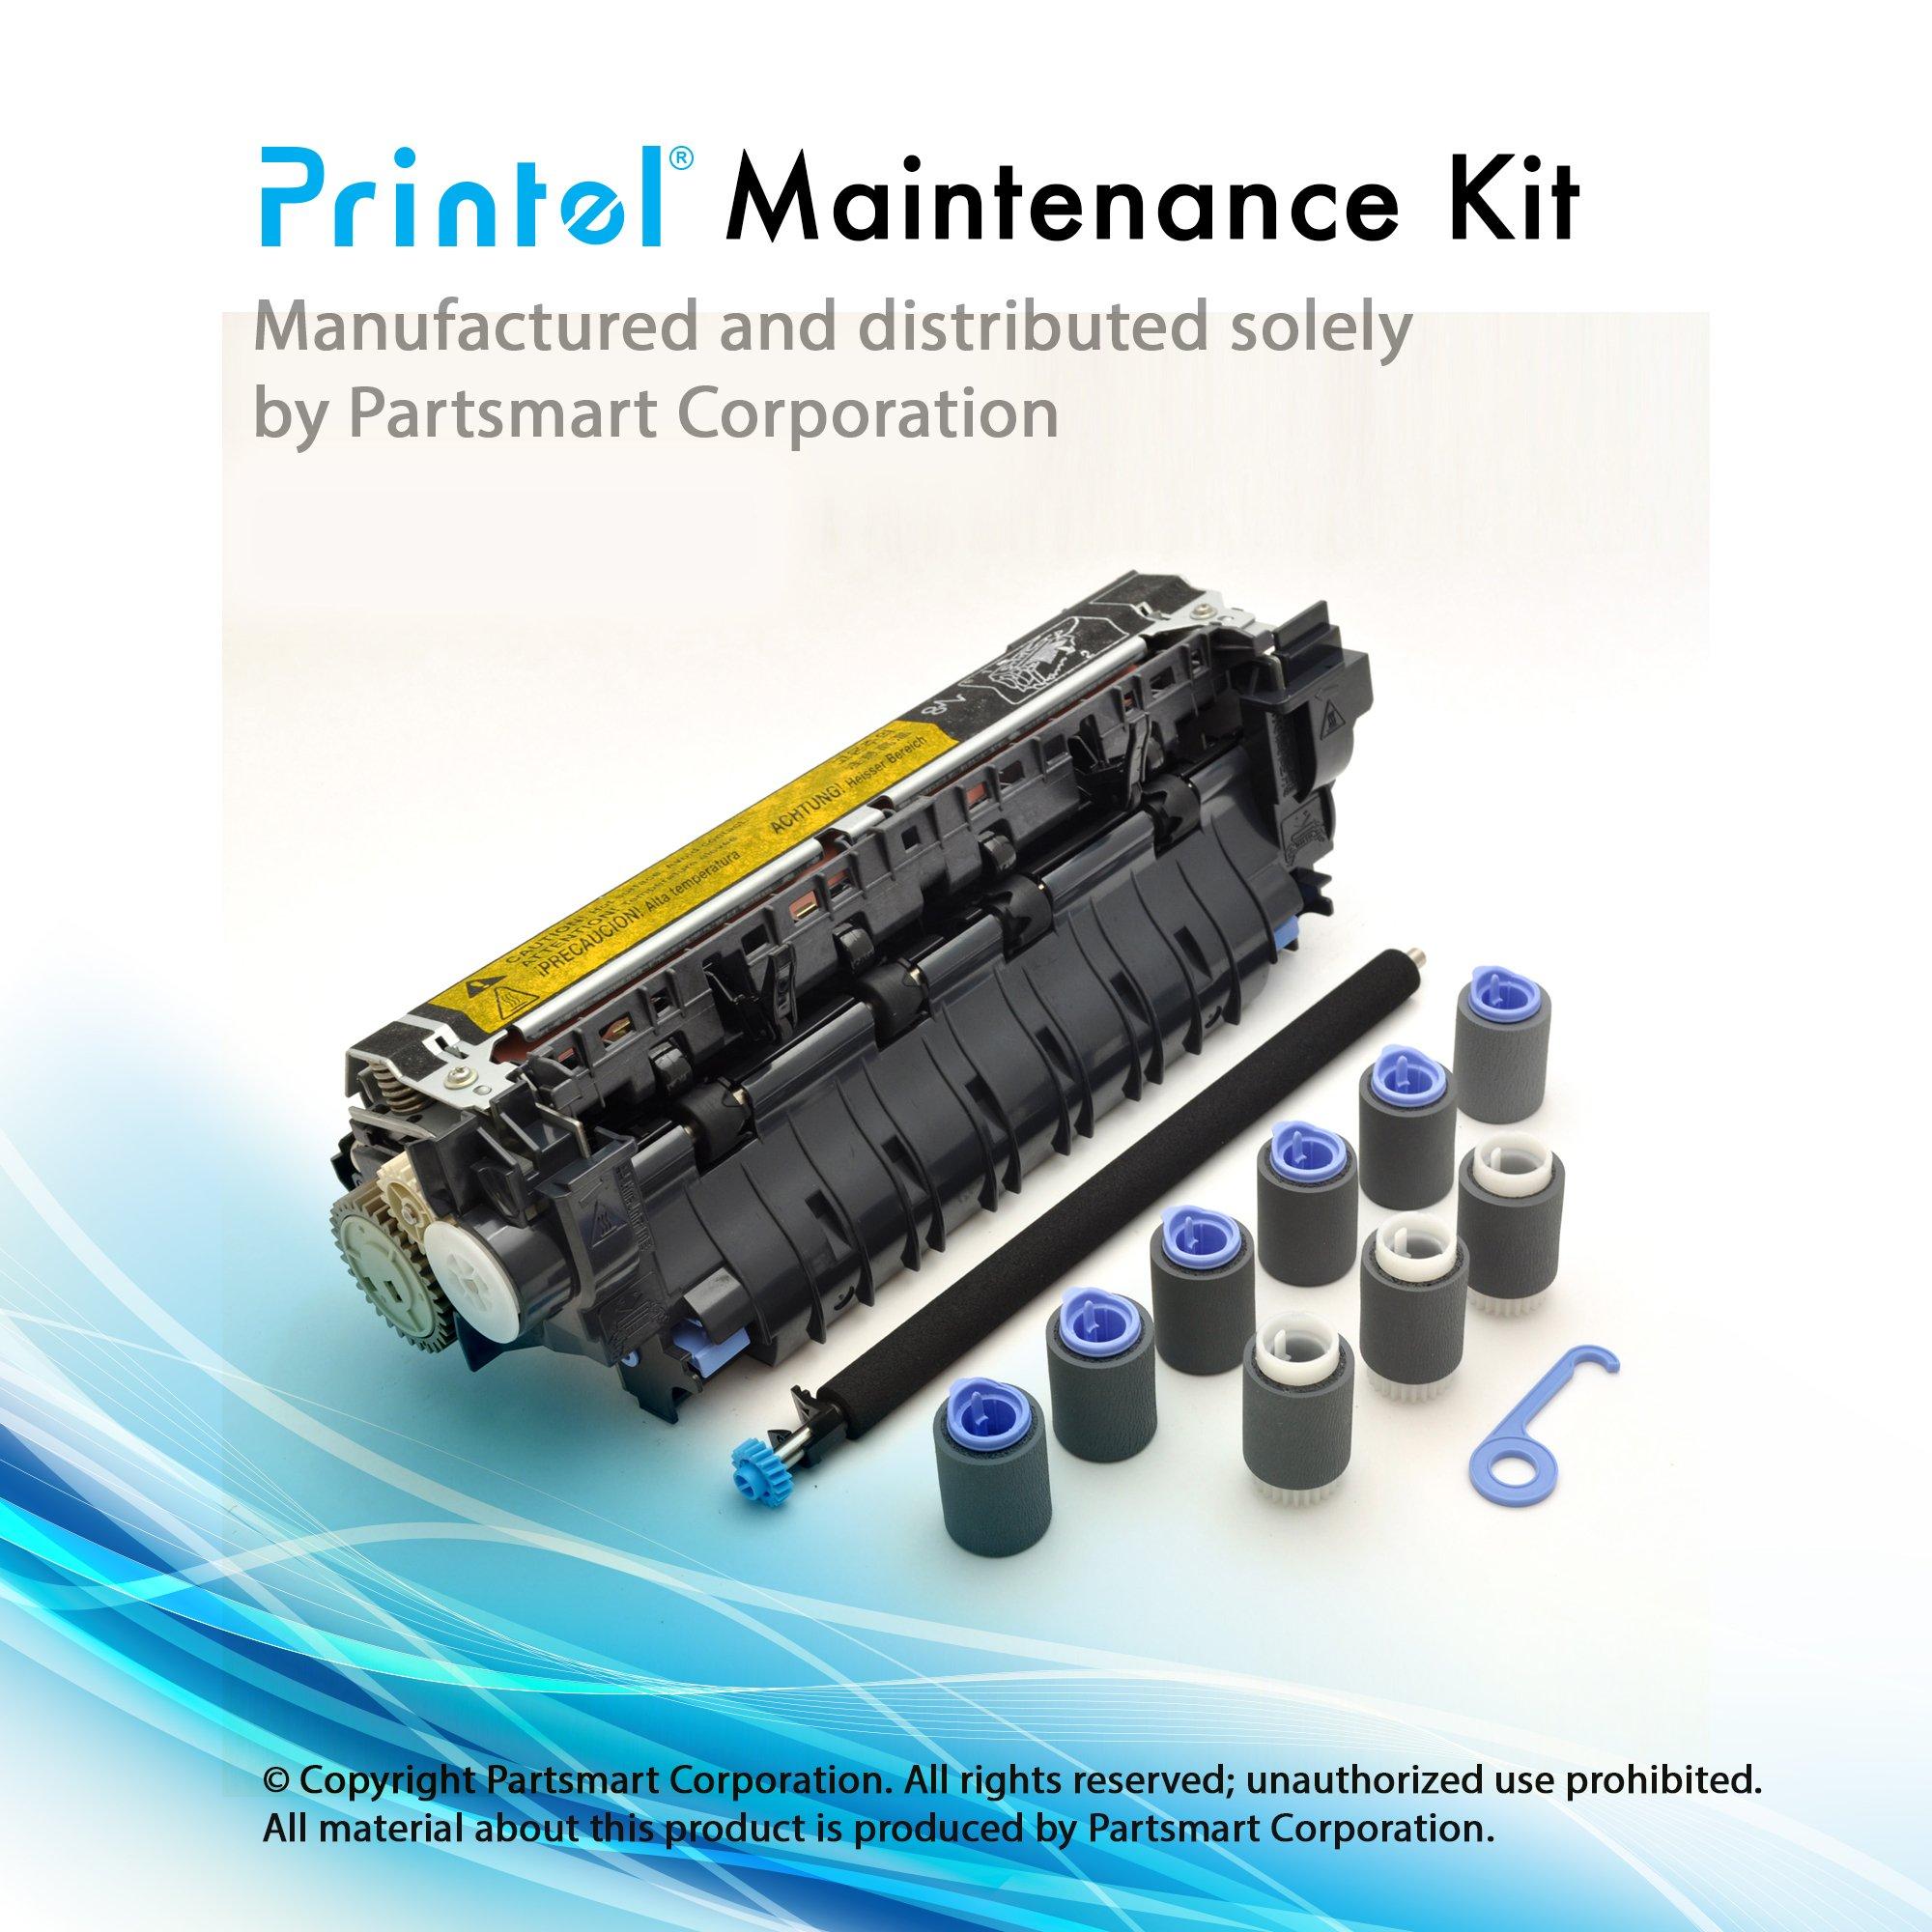 Maintenance Kit for HP Laserjet printers: HP P4014 P4015 (110V), CB388A